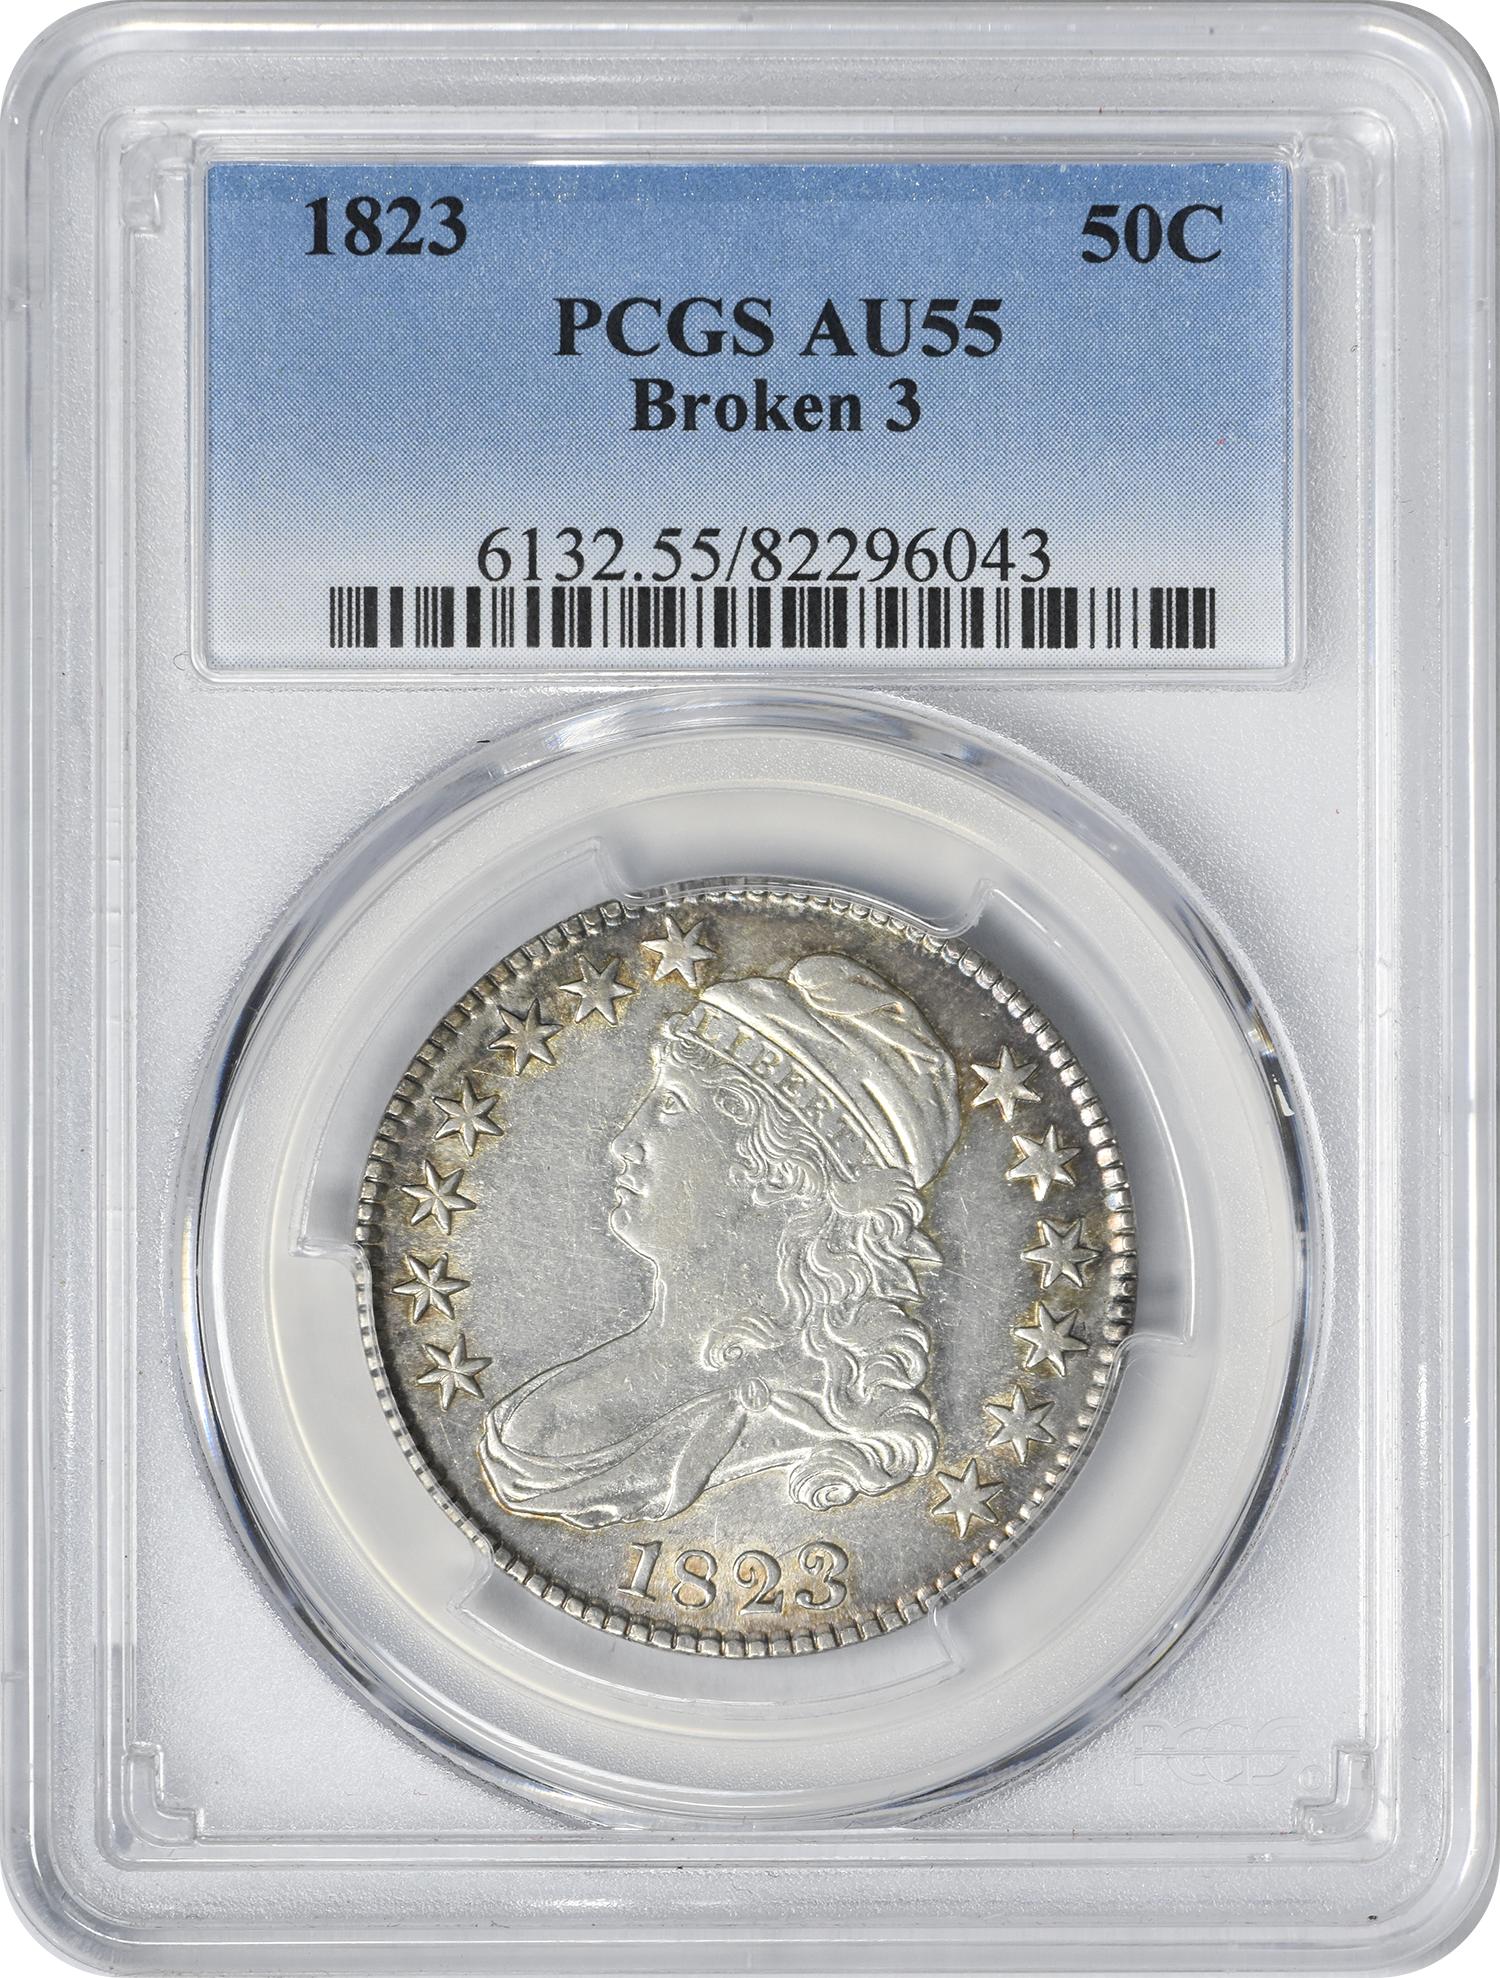 1823 Bust Silver Half Dollar Broken 3 AU55 PCGS